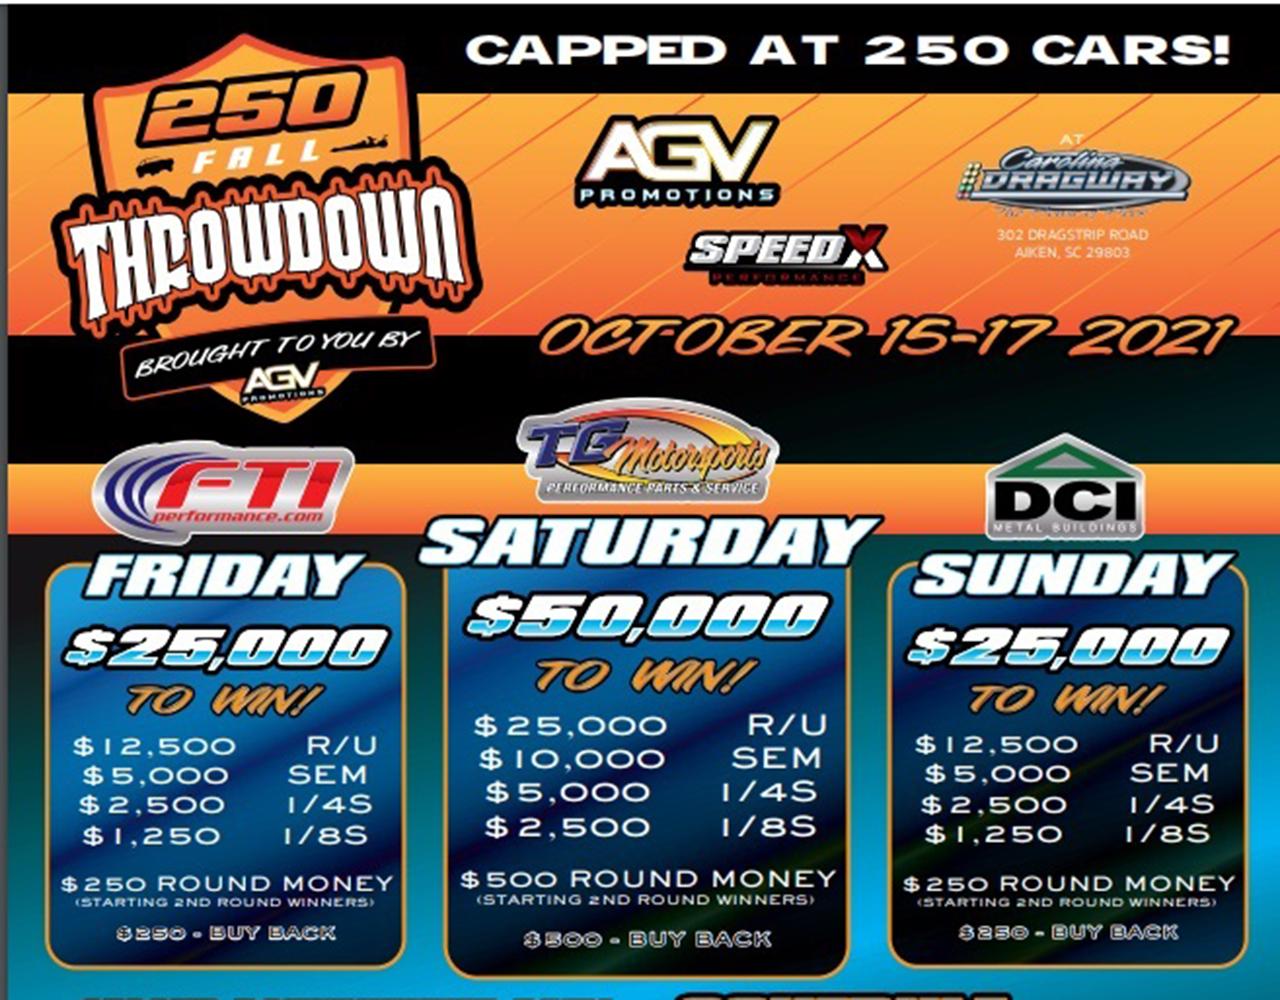 FREE LIVE STREAMING DRAG RACING: The 250 Throwdown At Carolina Dragway Starts Today!